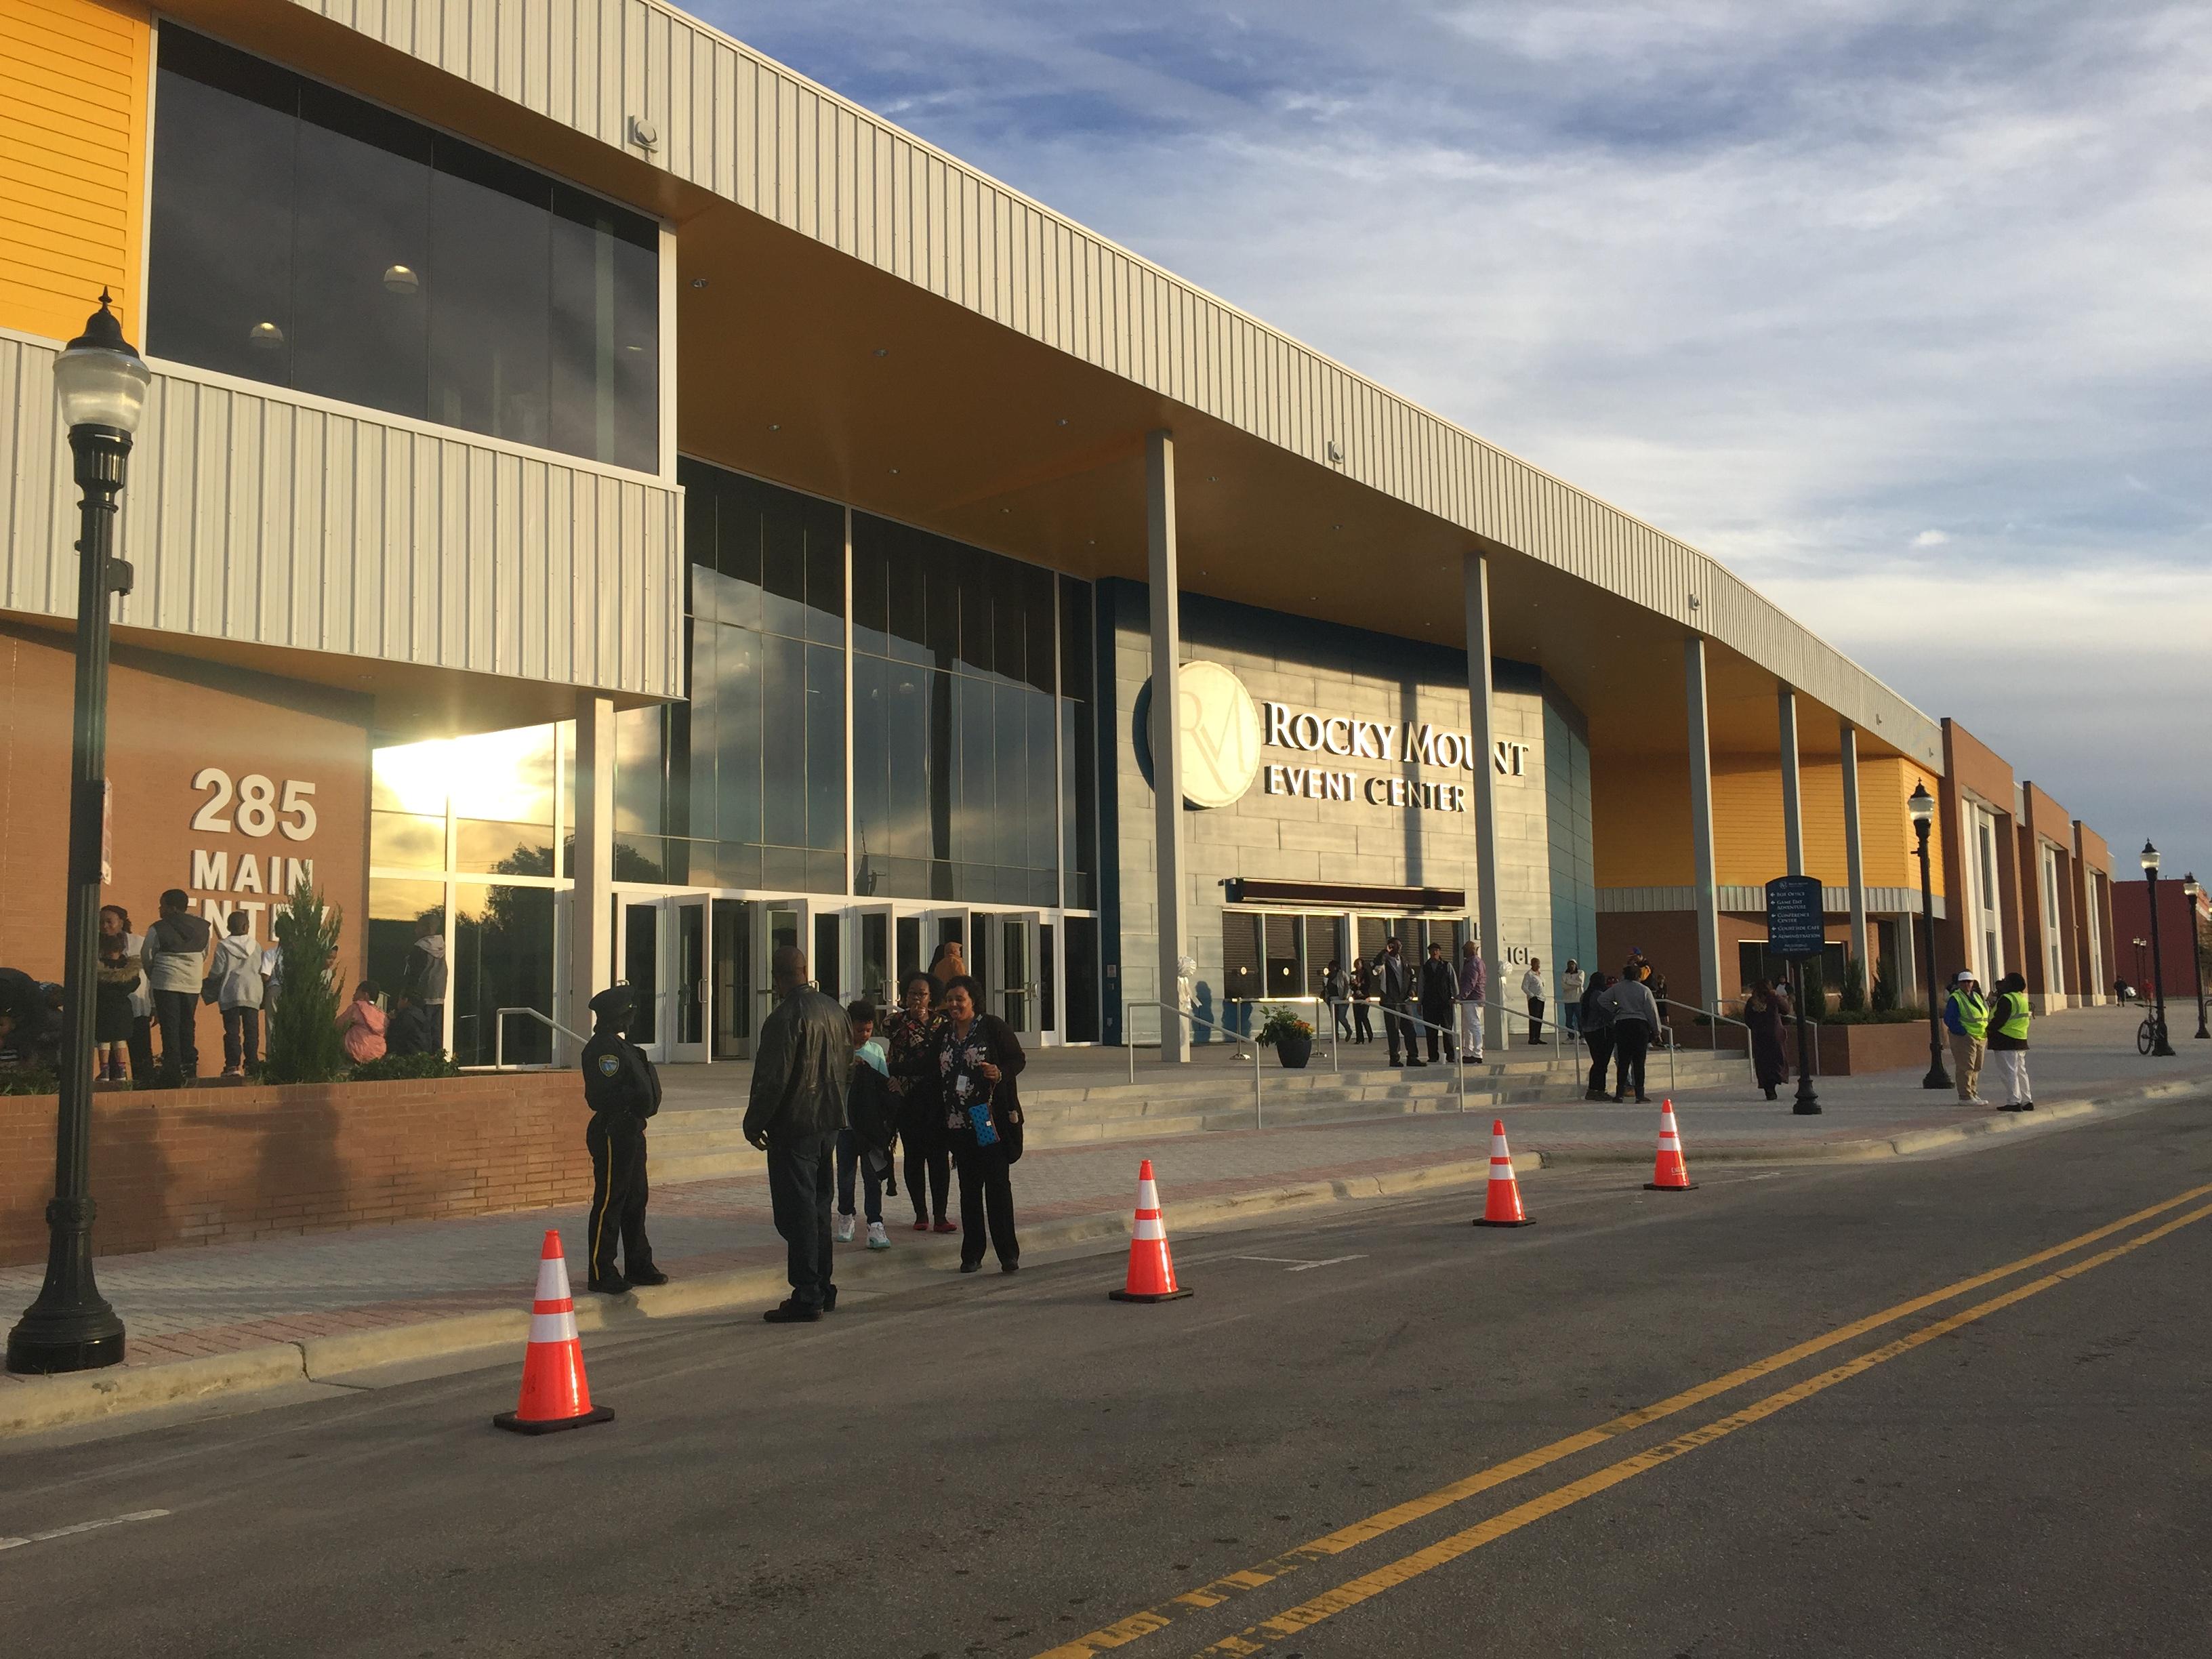 Rocky Mount Event Center Halloween 2020 Rocky Mount Event Center 2019 Recap, New GM Announced   The Grey